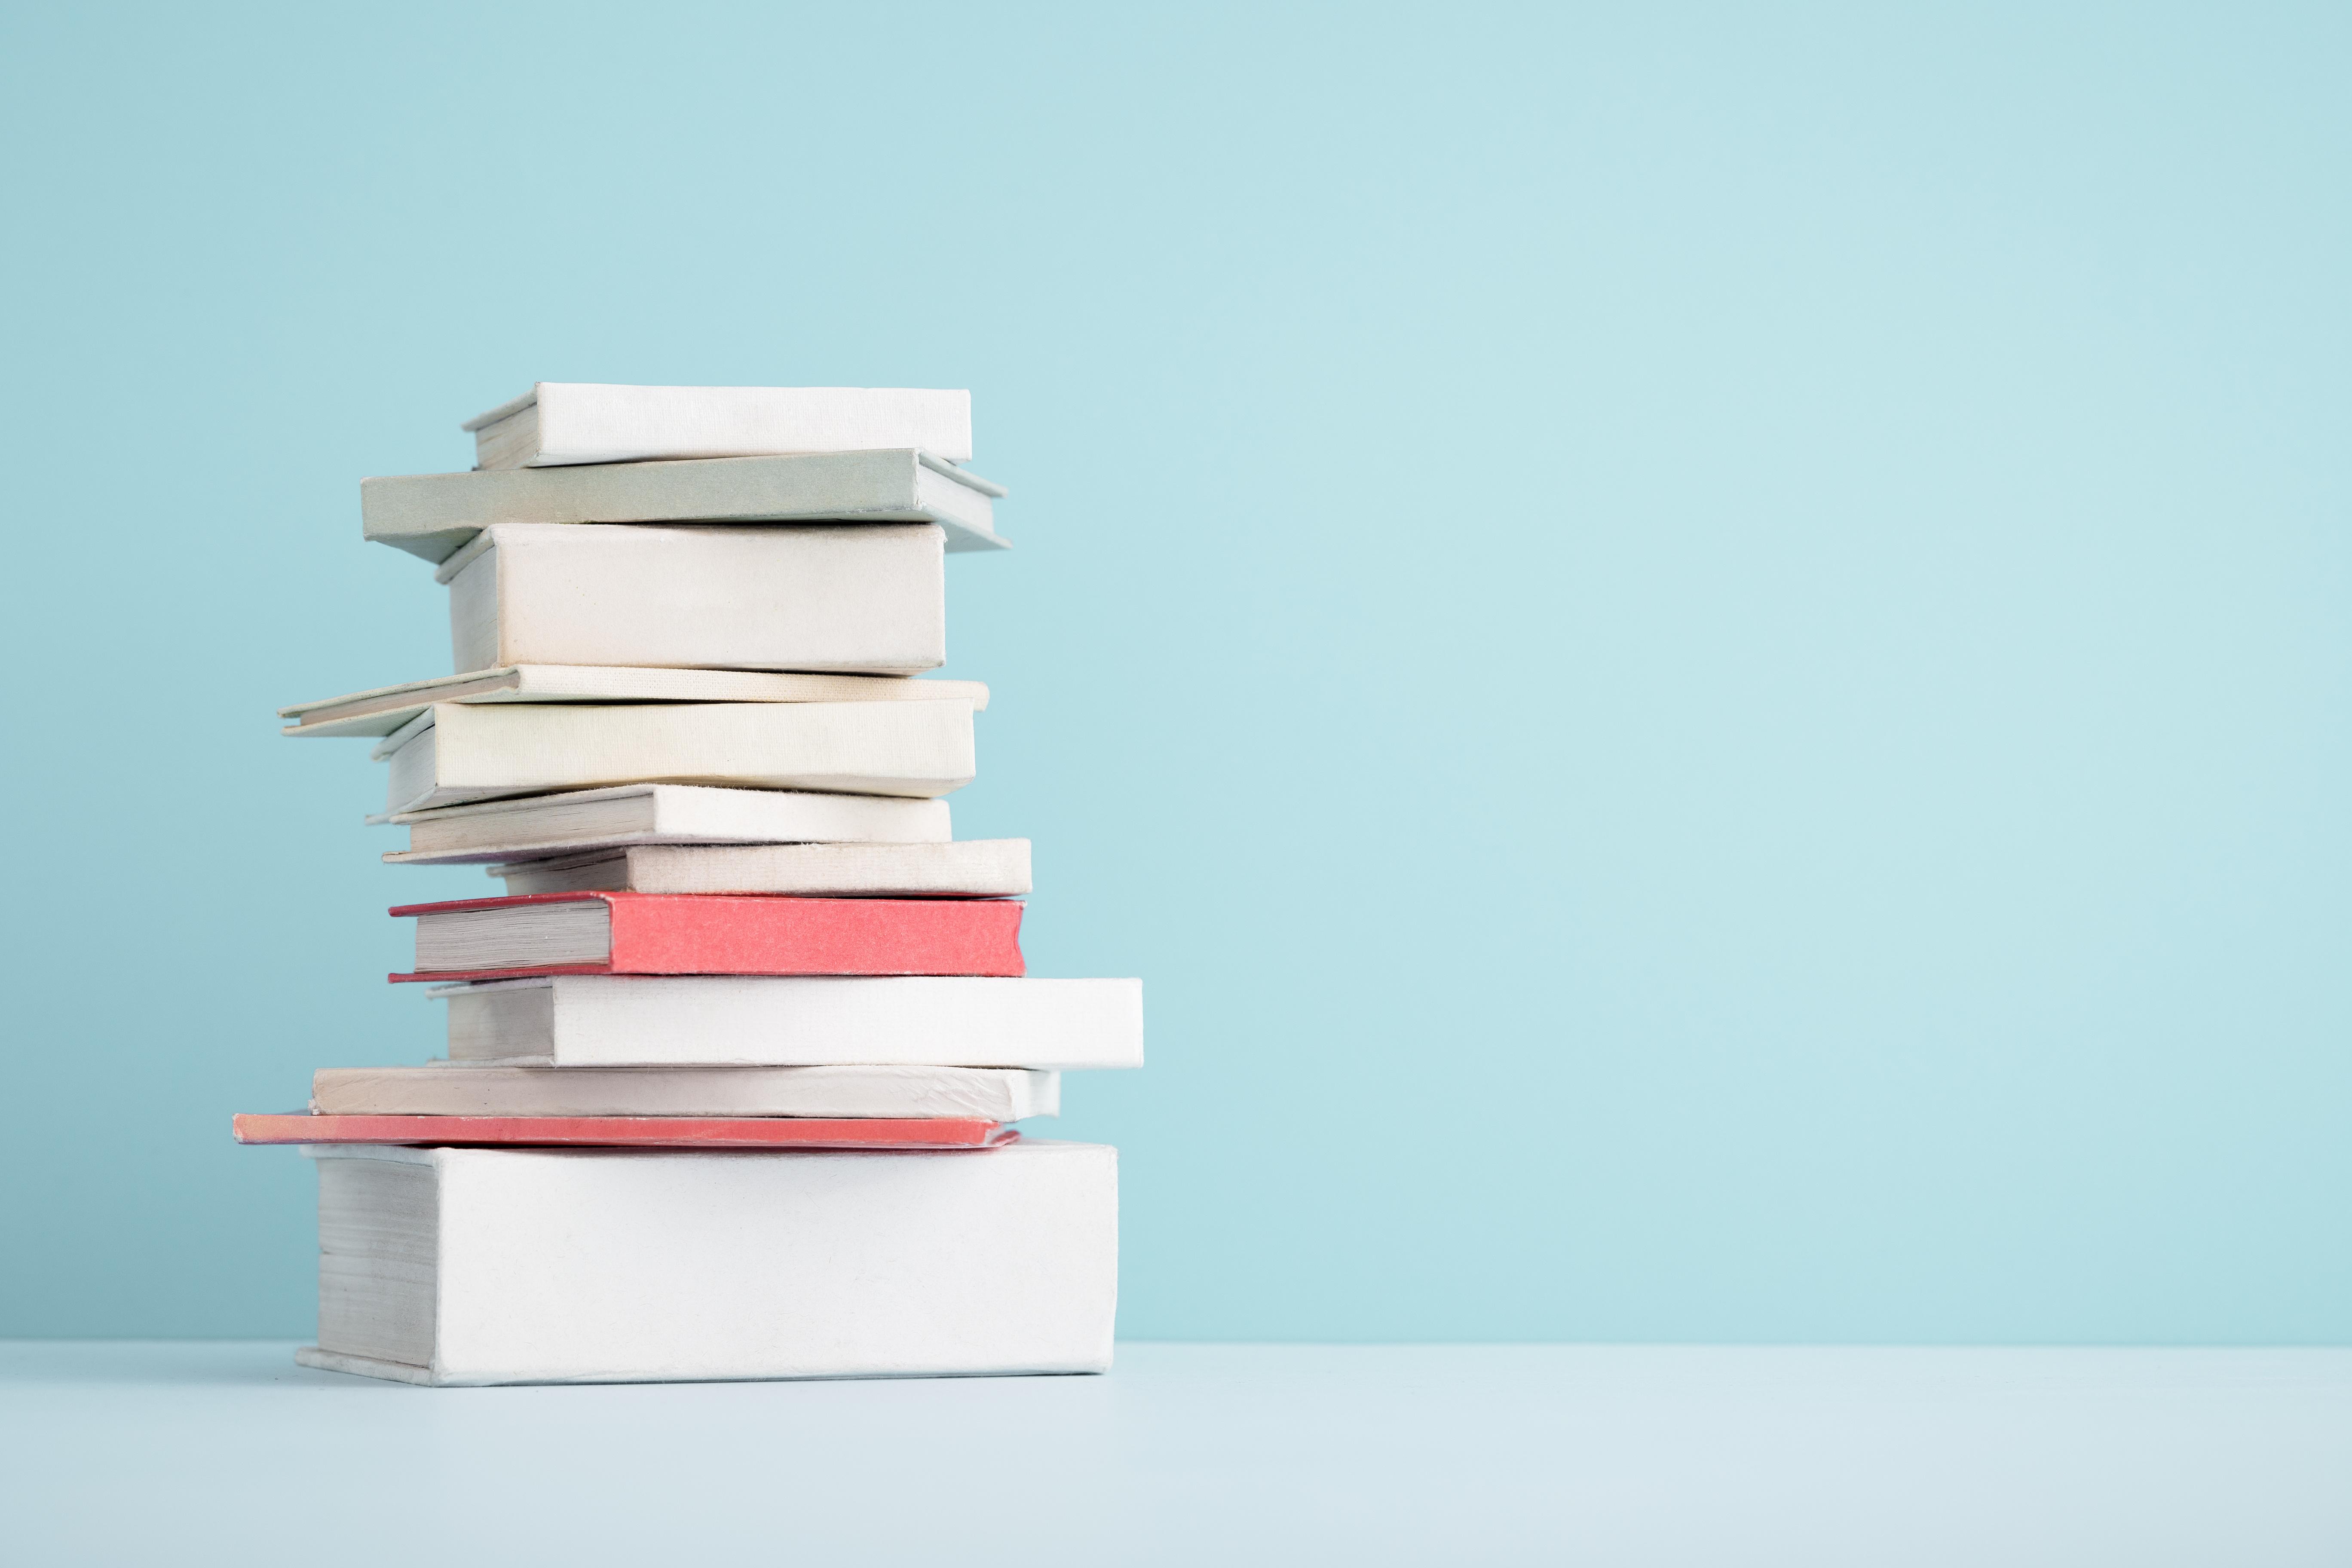 kilka książek na stole